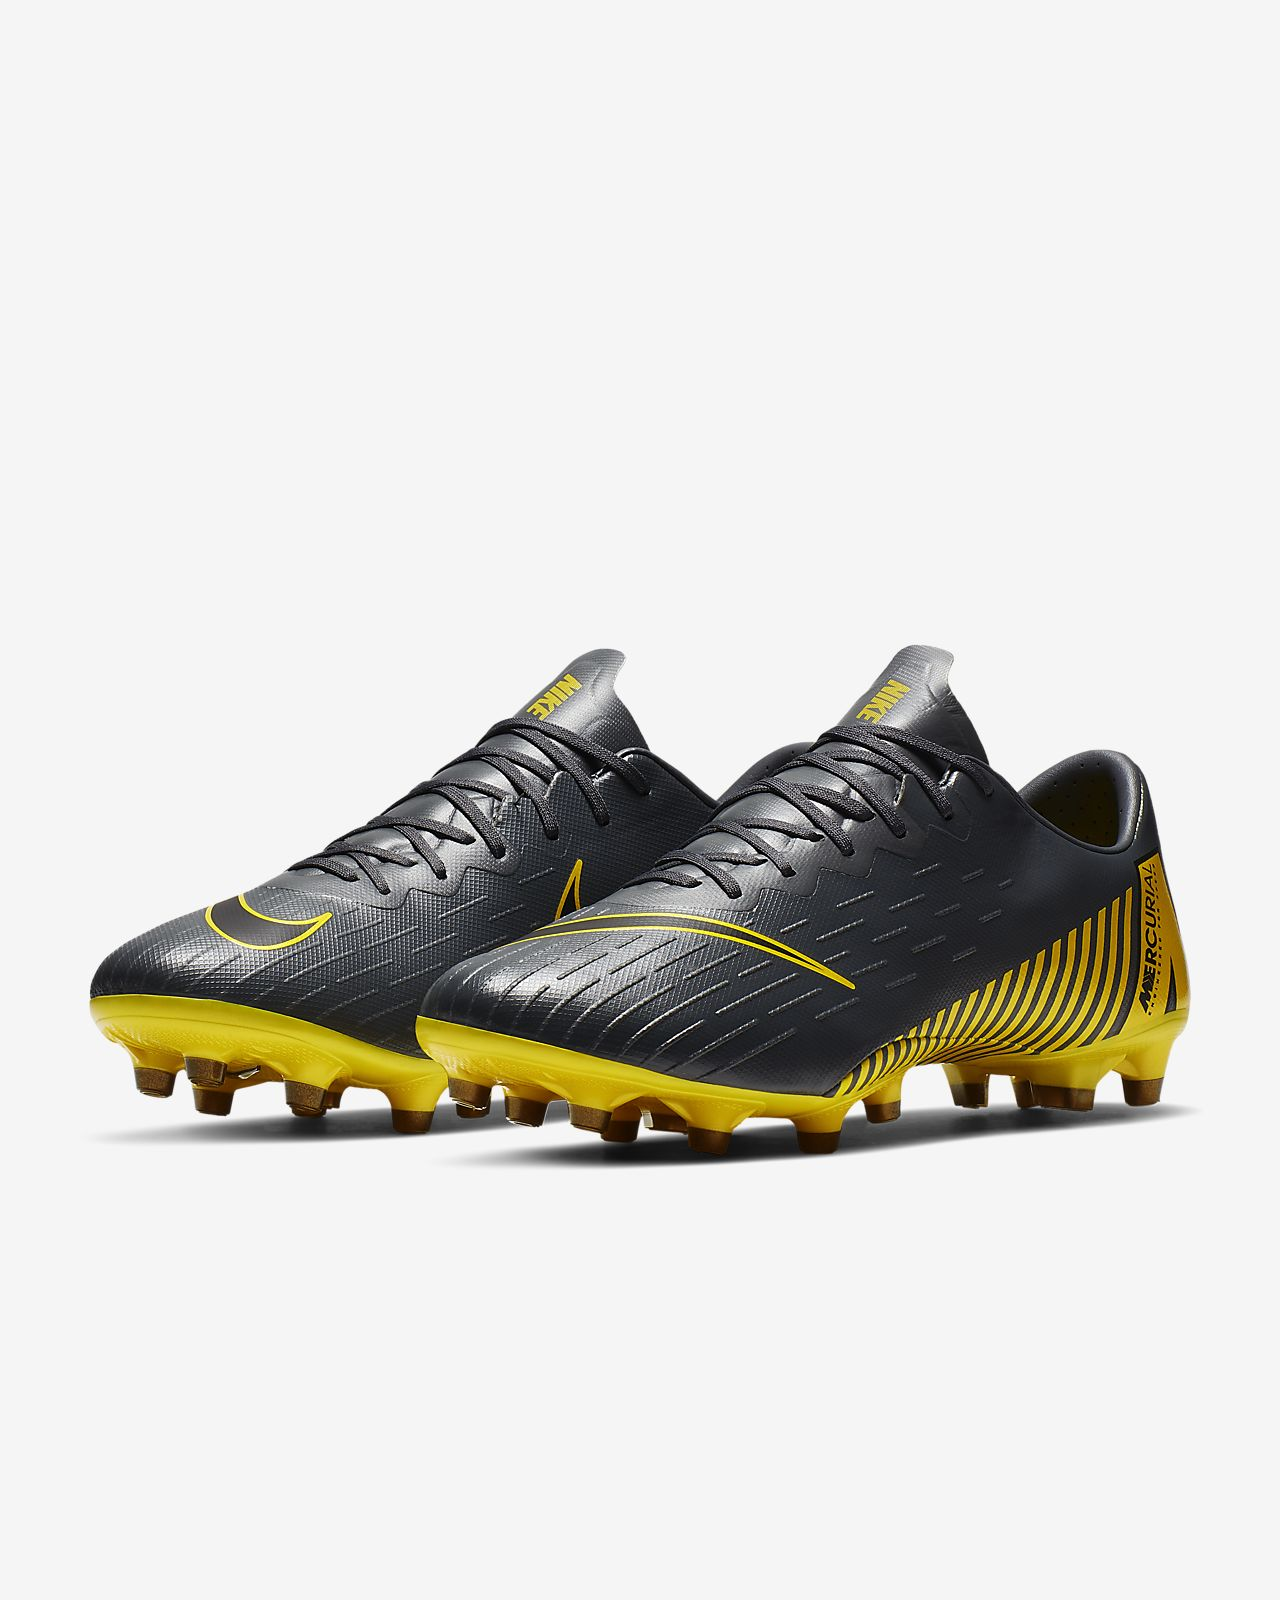 f0decaa63 Nike Mercurial Vapor XII Pro AG-PRO Artificial-Grass Football Boot ...